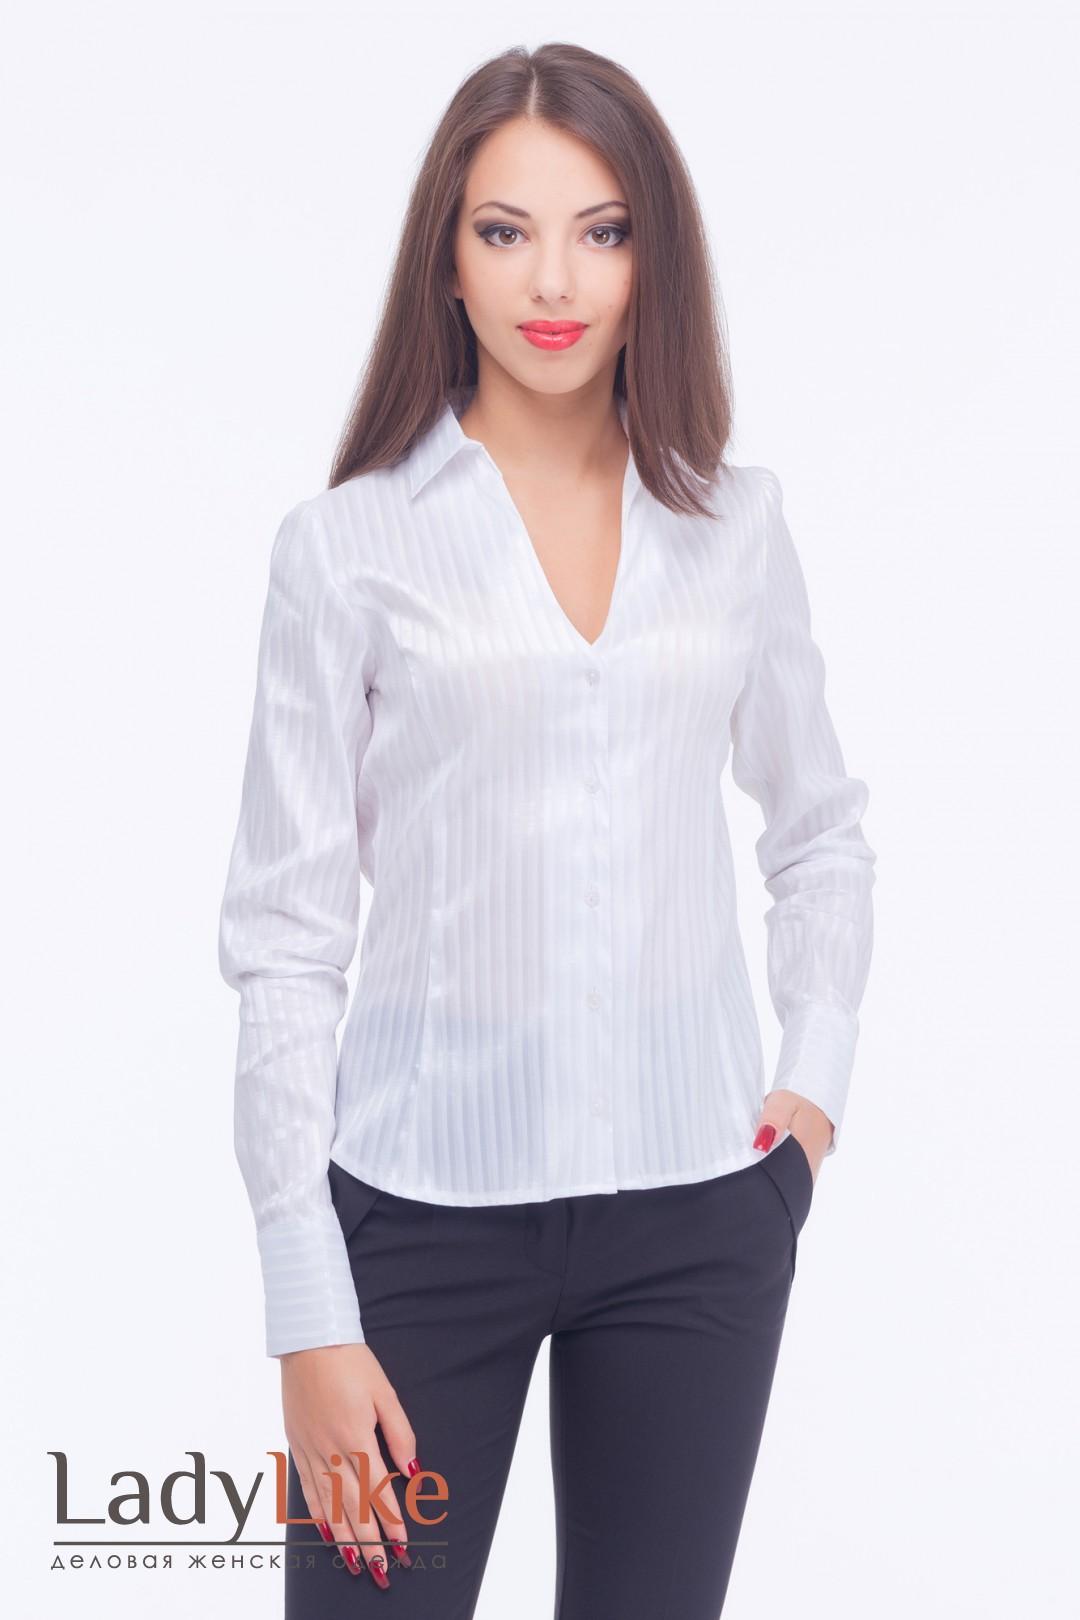 Женские Блузки И Рубашки Магазин В Омске